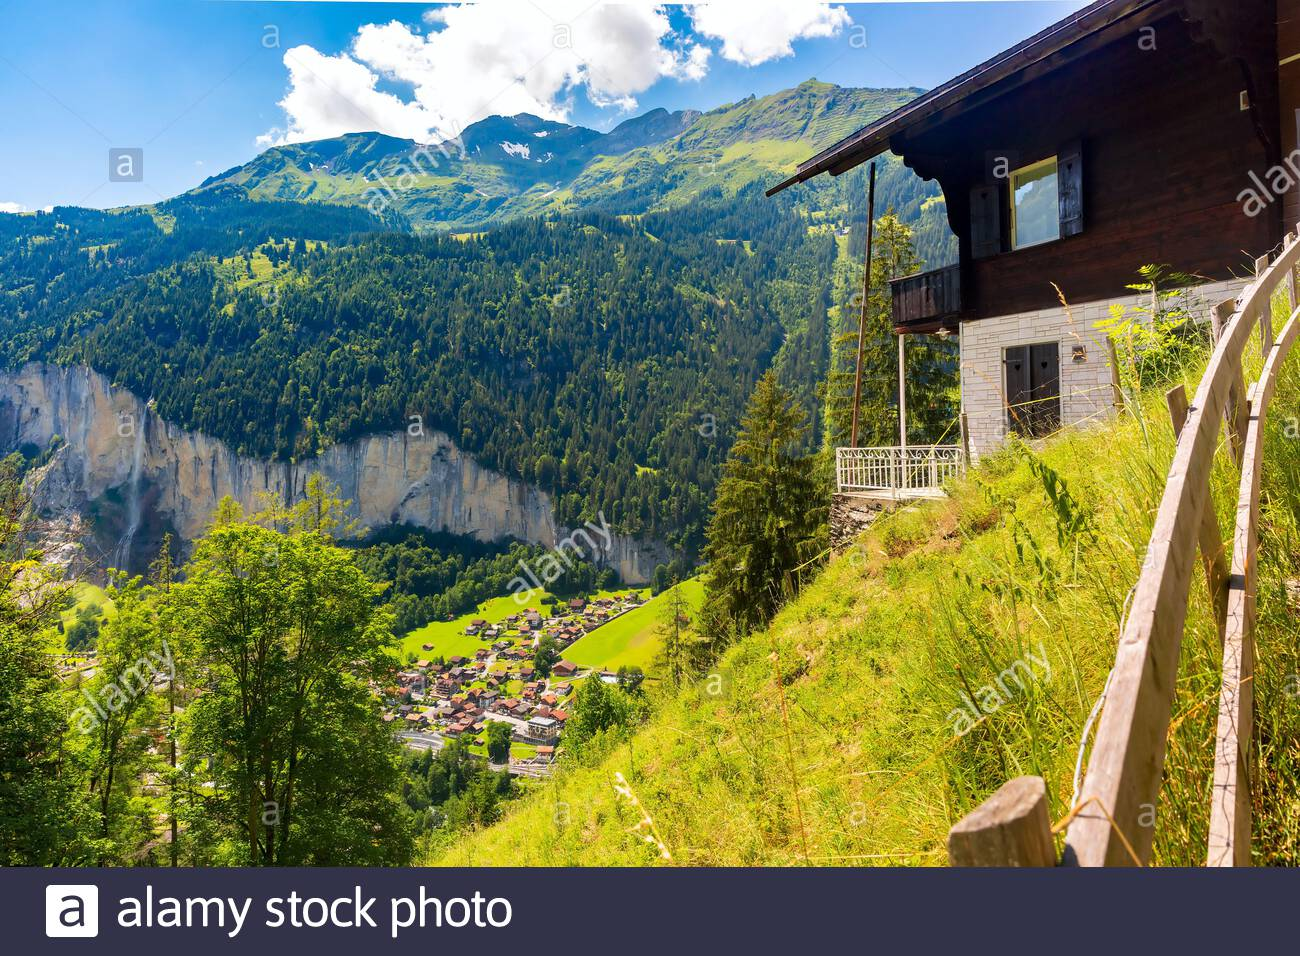 Casa solitaria cerca de la aldea de montaña Lauterbrunnen, Oberland bernés, Suiza. Foto de stock